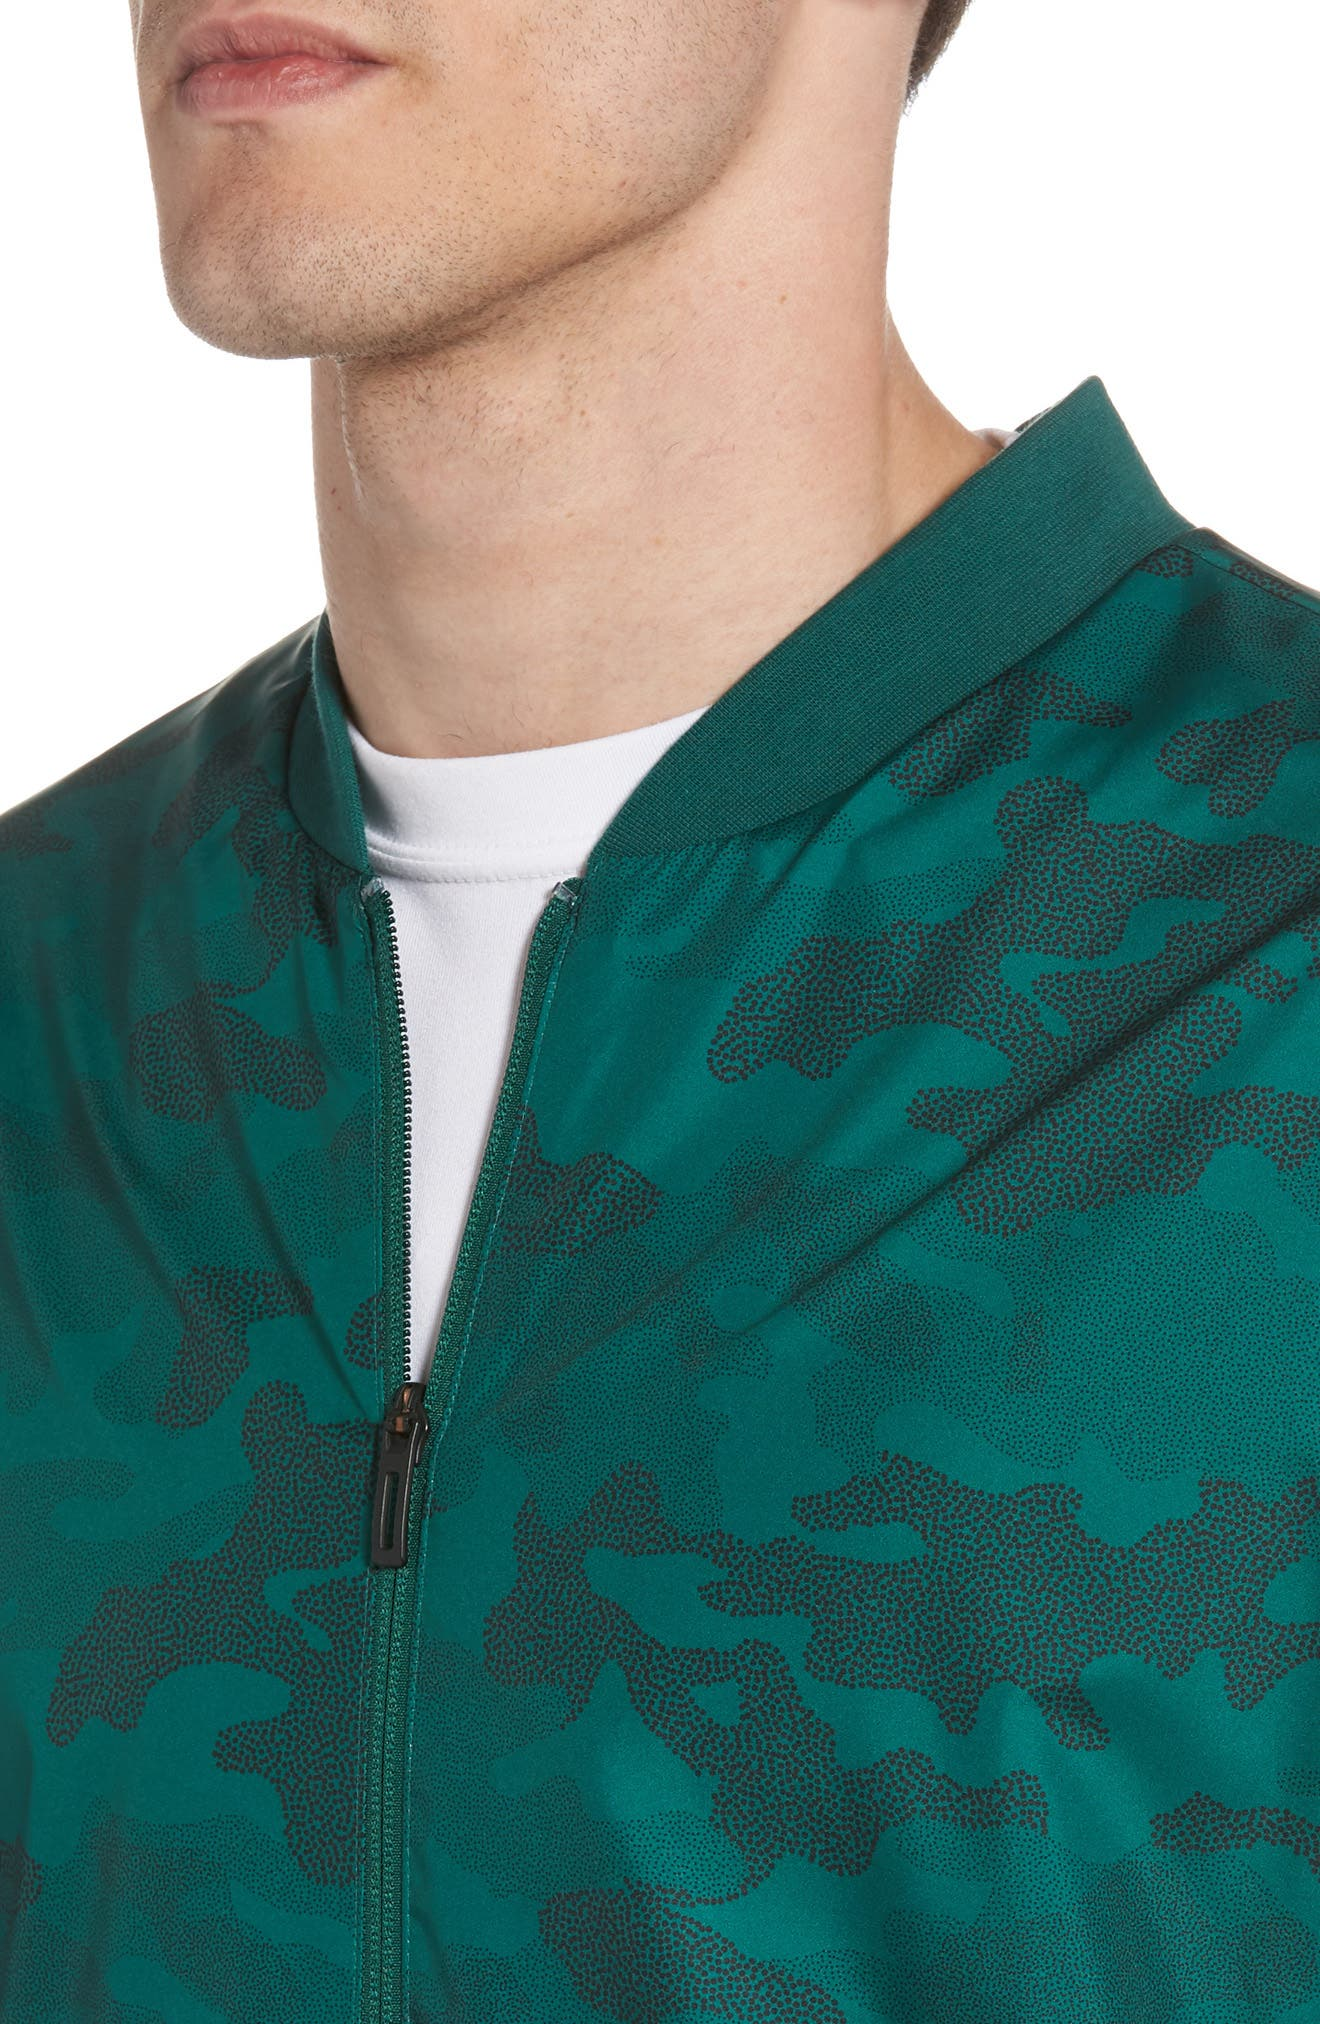 Regular Fit Track Jacket,                             Alternate thumbnail 4, color,                             Collegiate Green/ Black